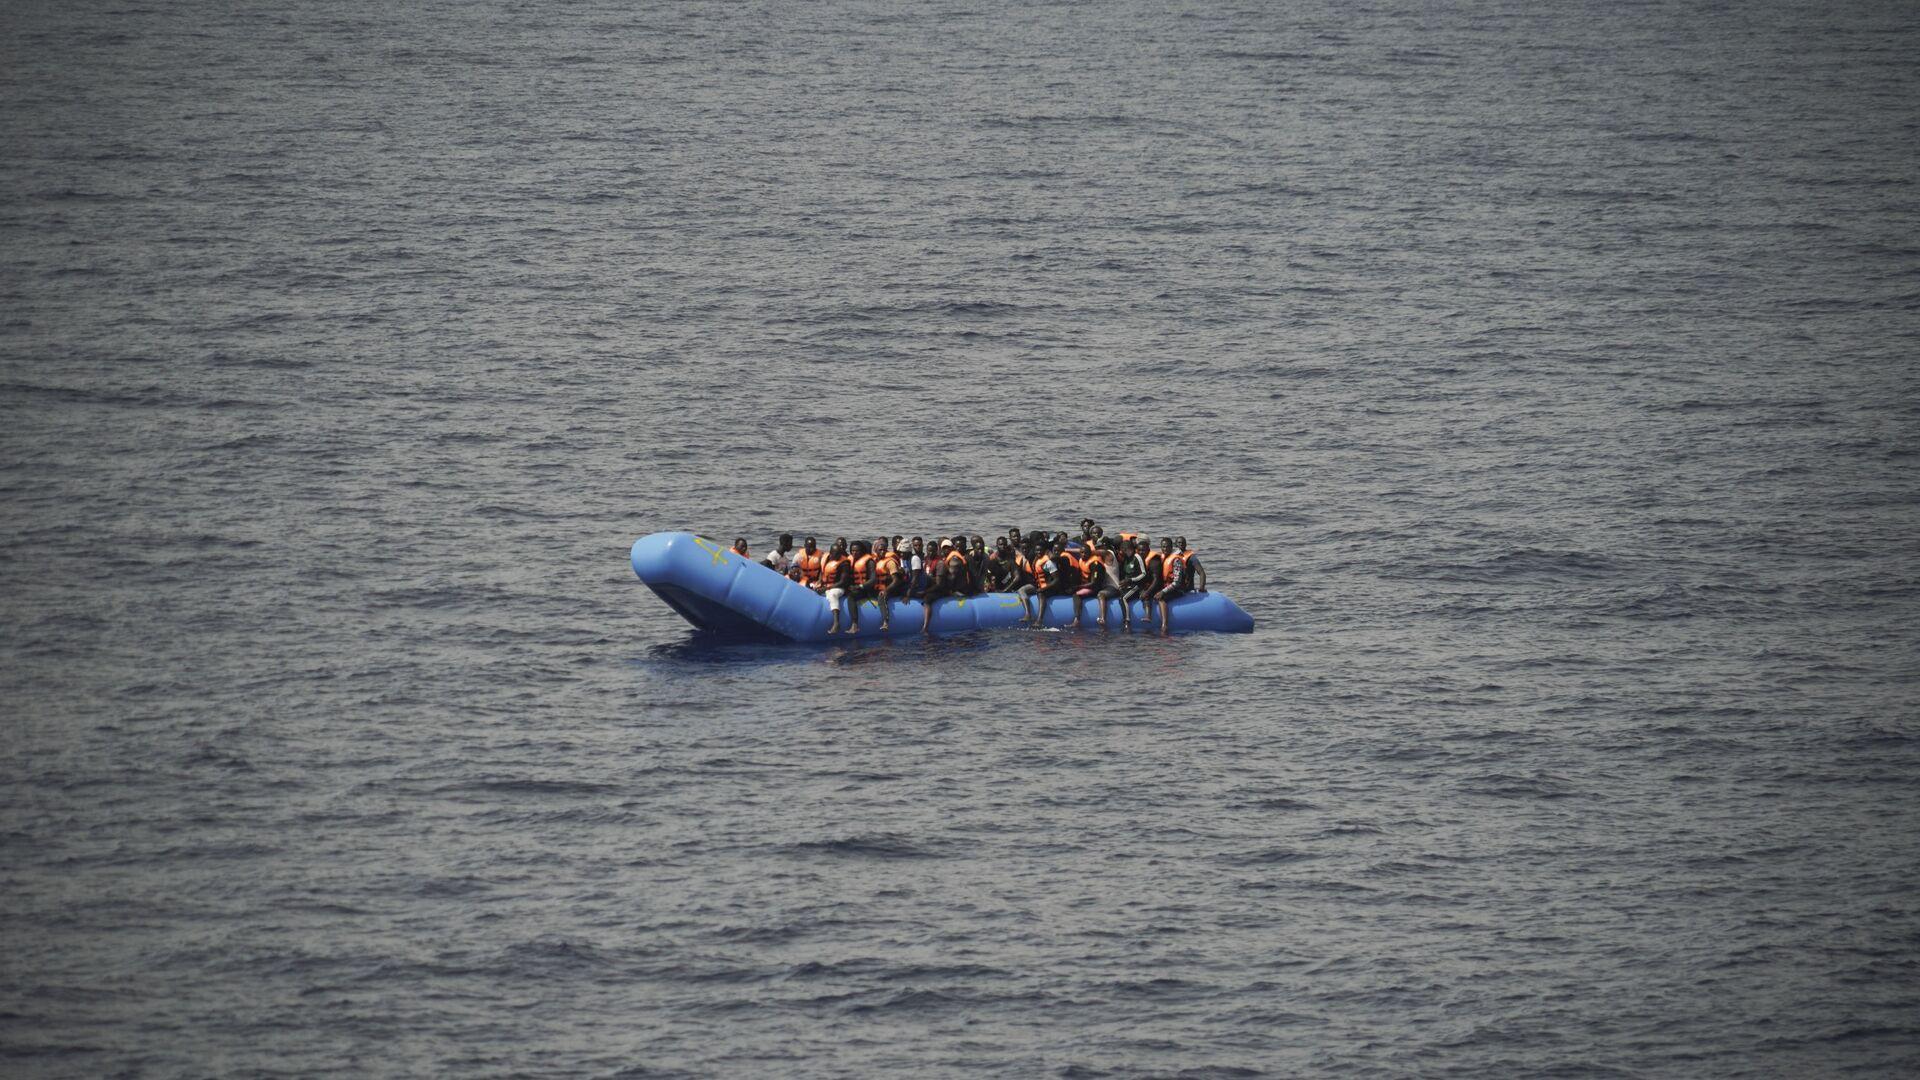 Migranti su una barca - Sputnik Italia, 1920, 14.08.2021